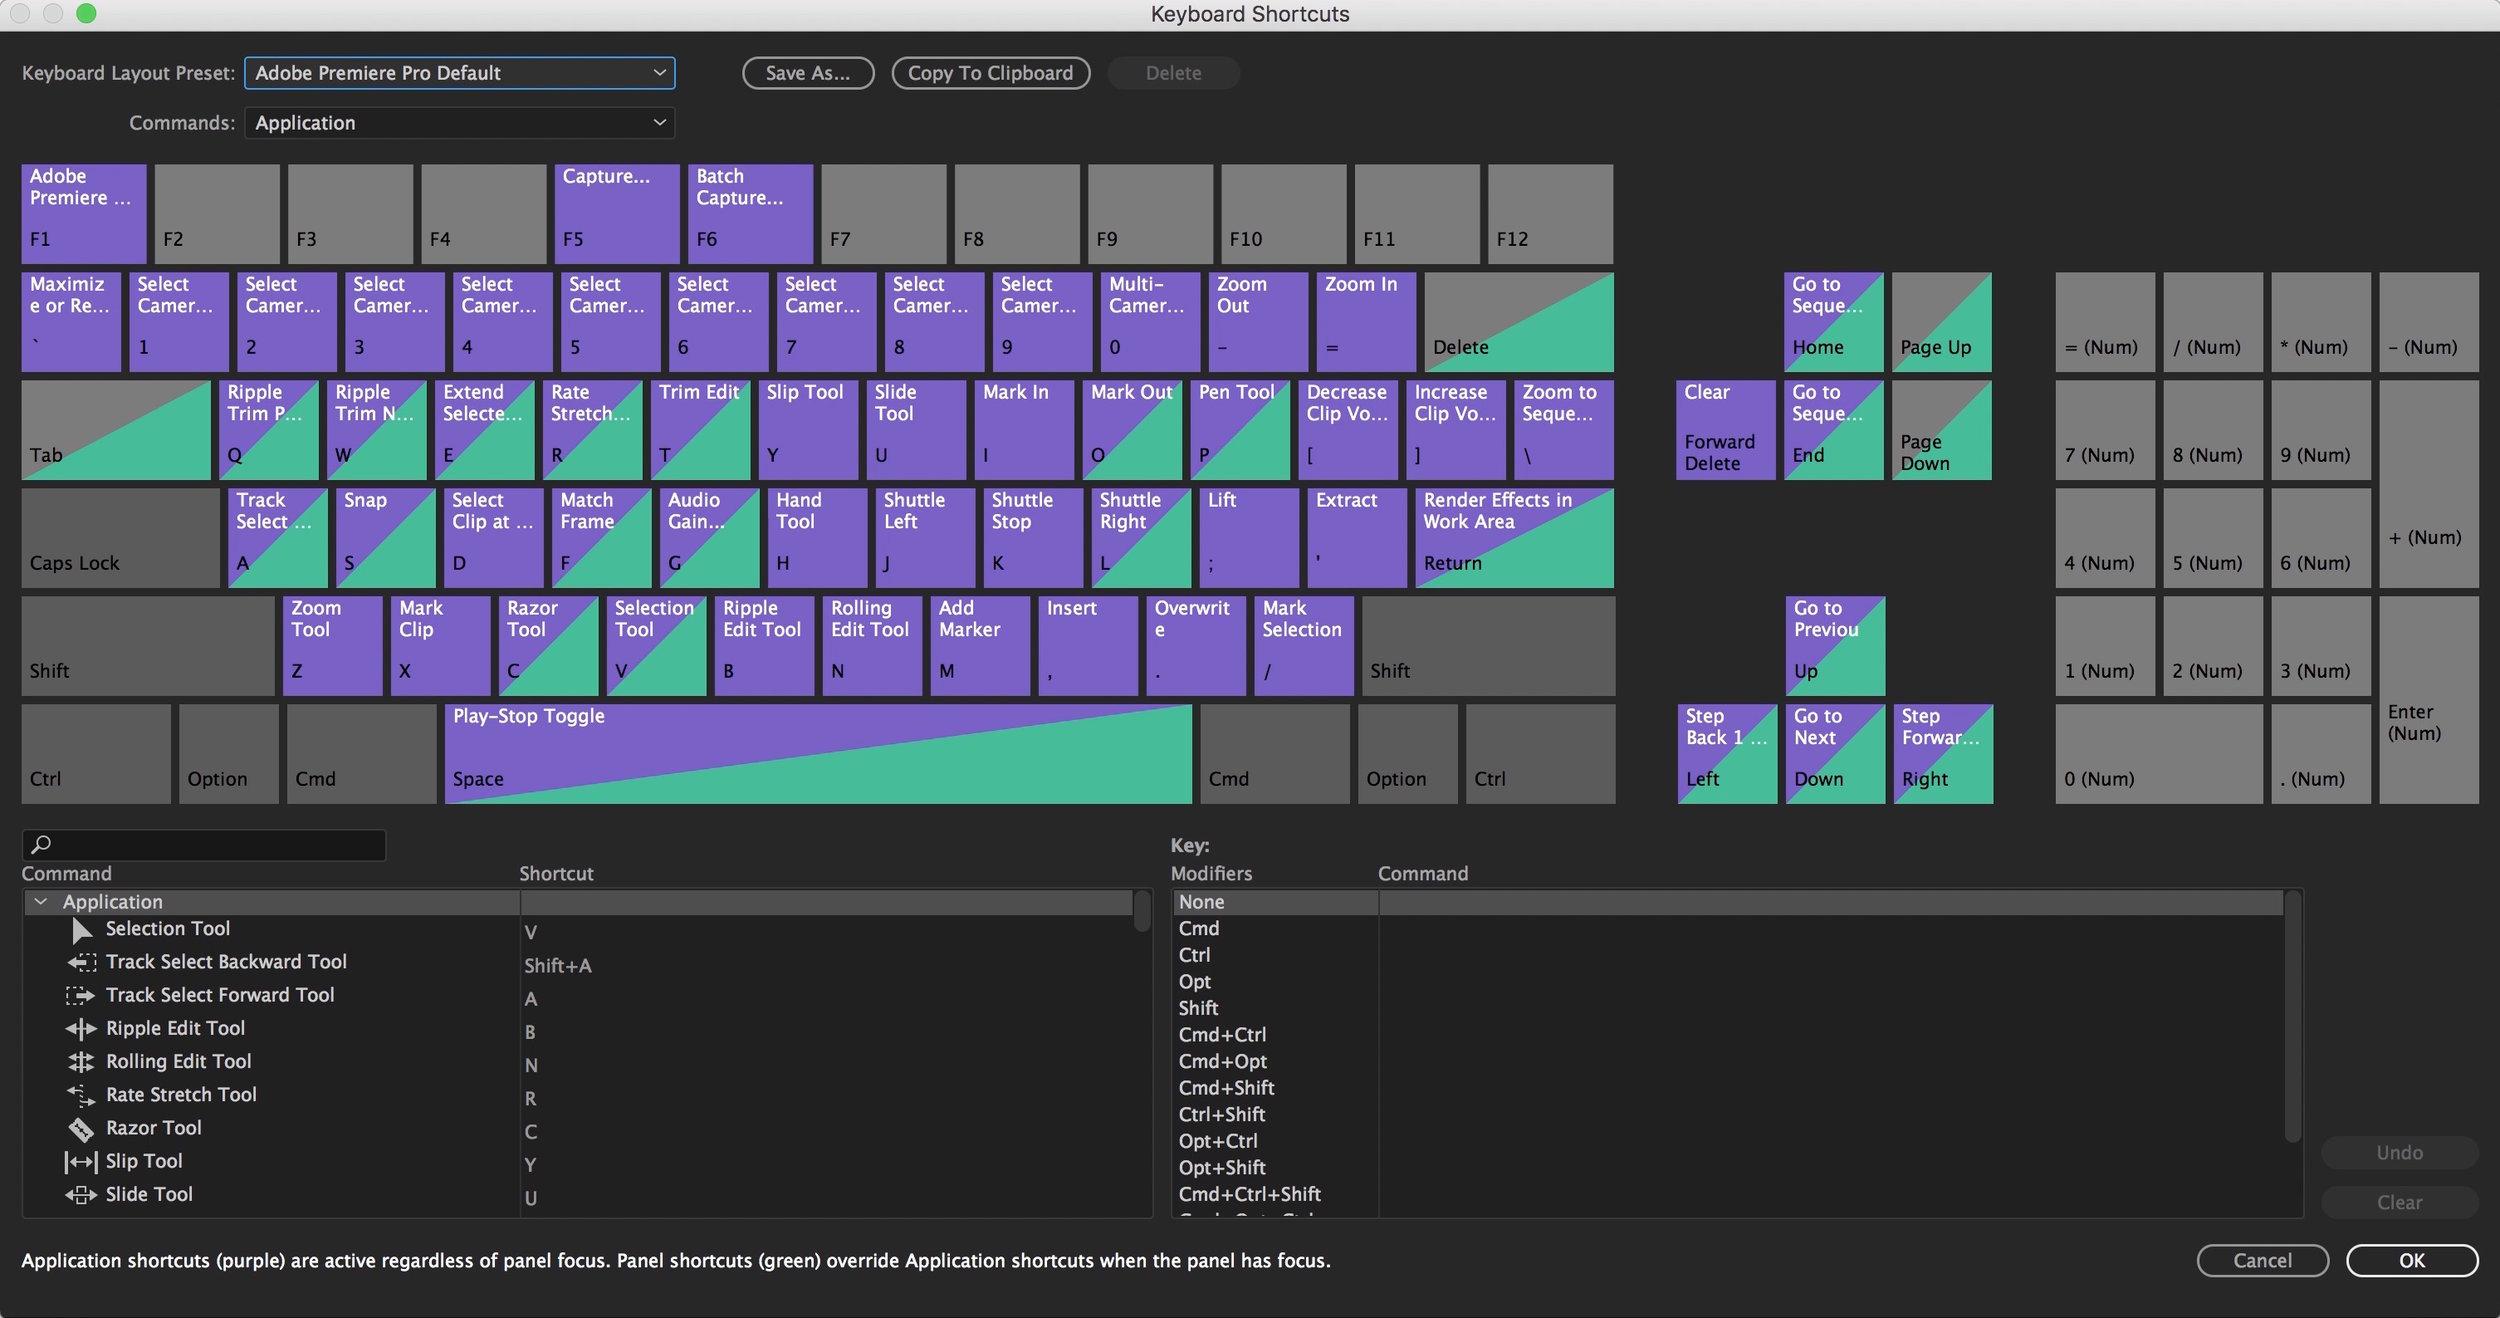 visual-keyboard-shortcut-map-premiere-pro-cc-2017